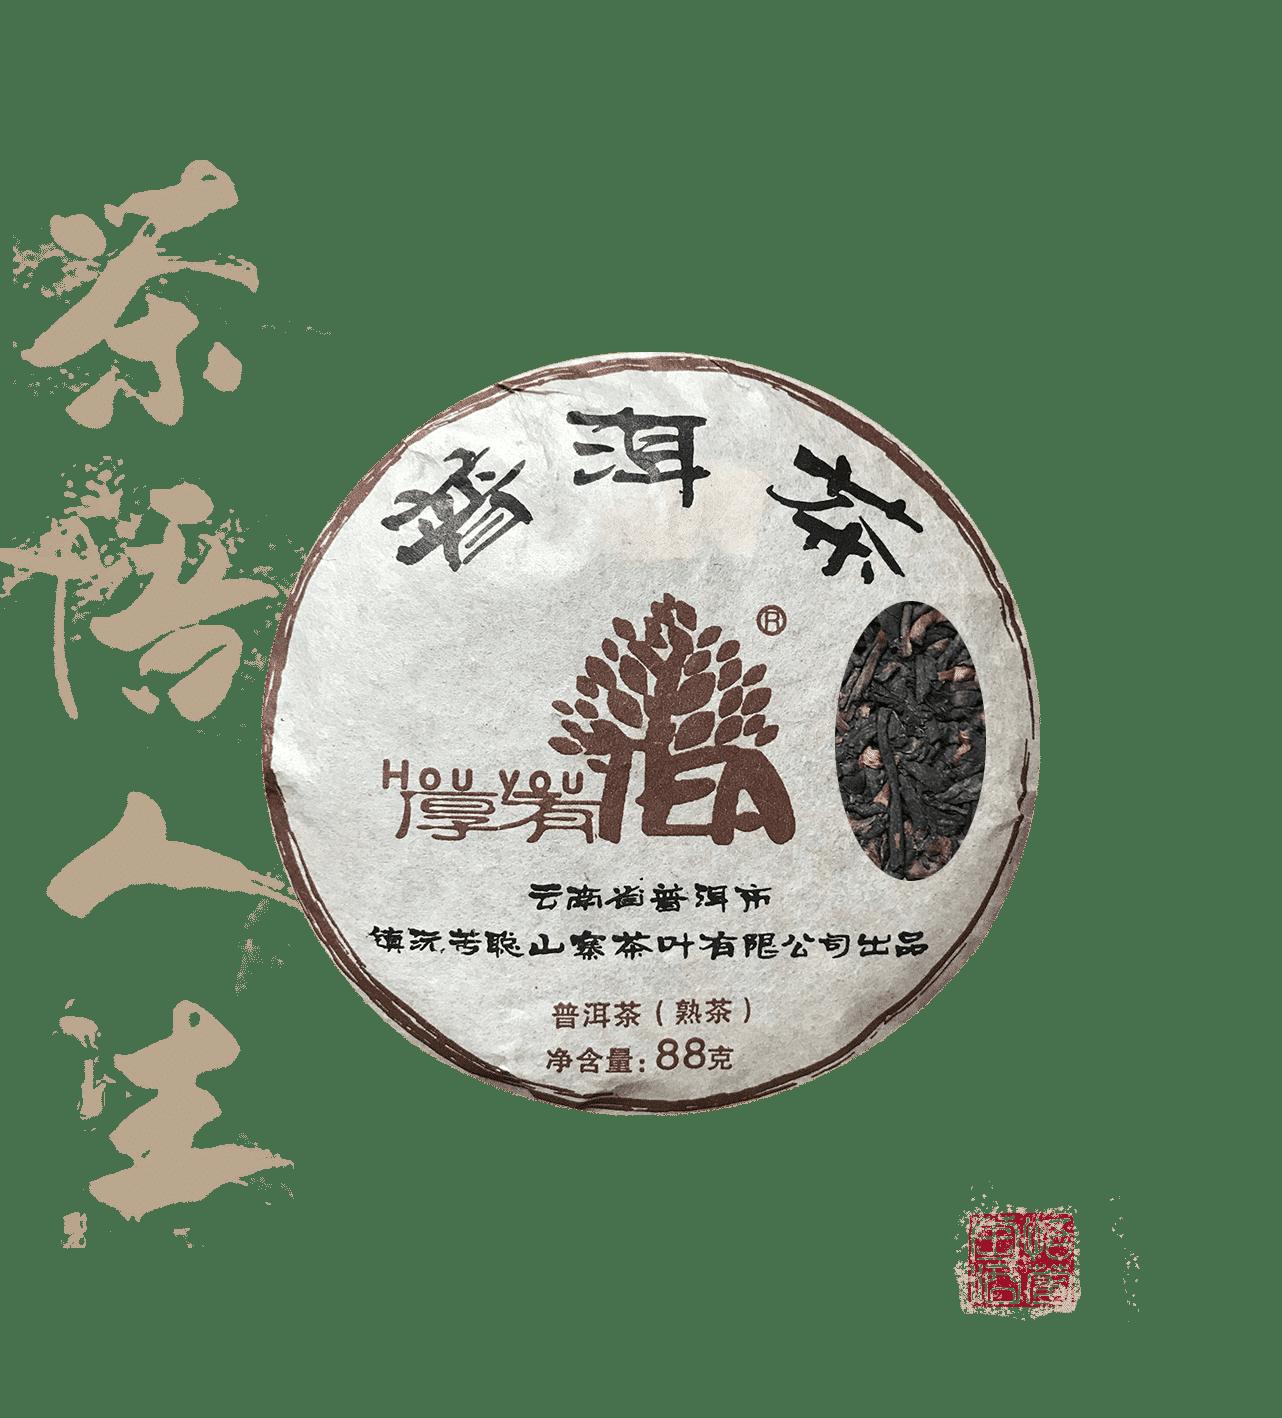 Hou you tea shou est un thé pu erh cuit du yunnan